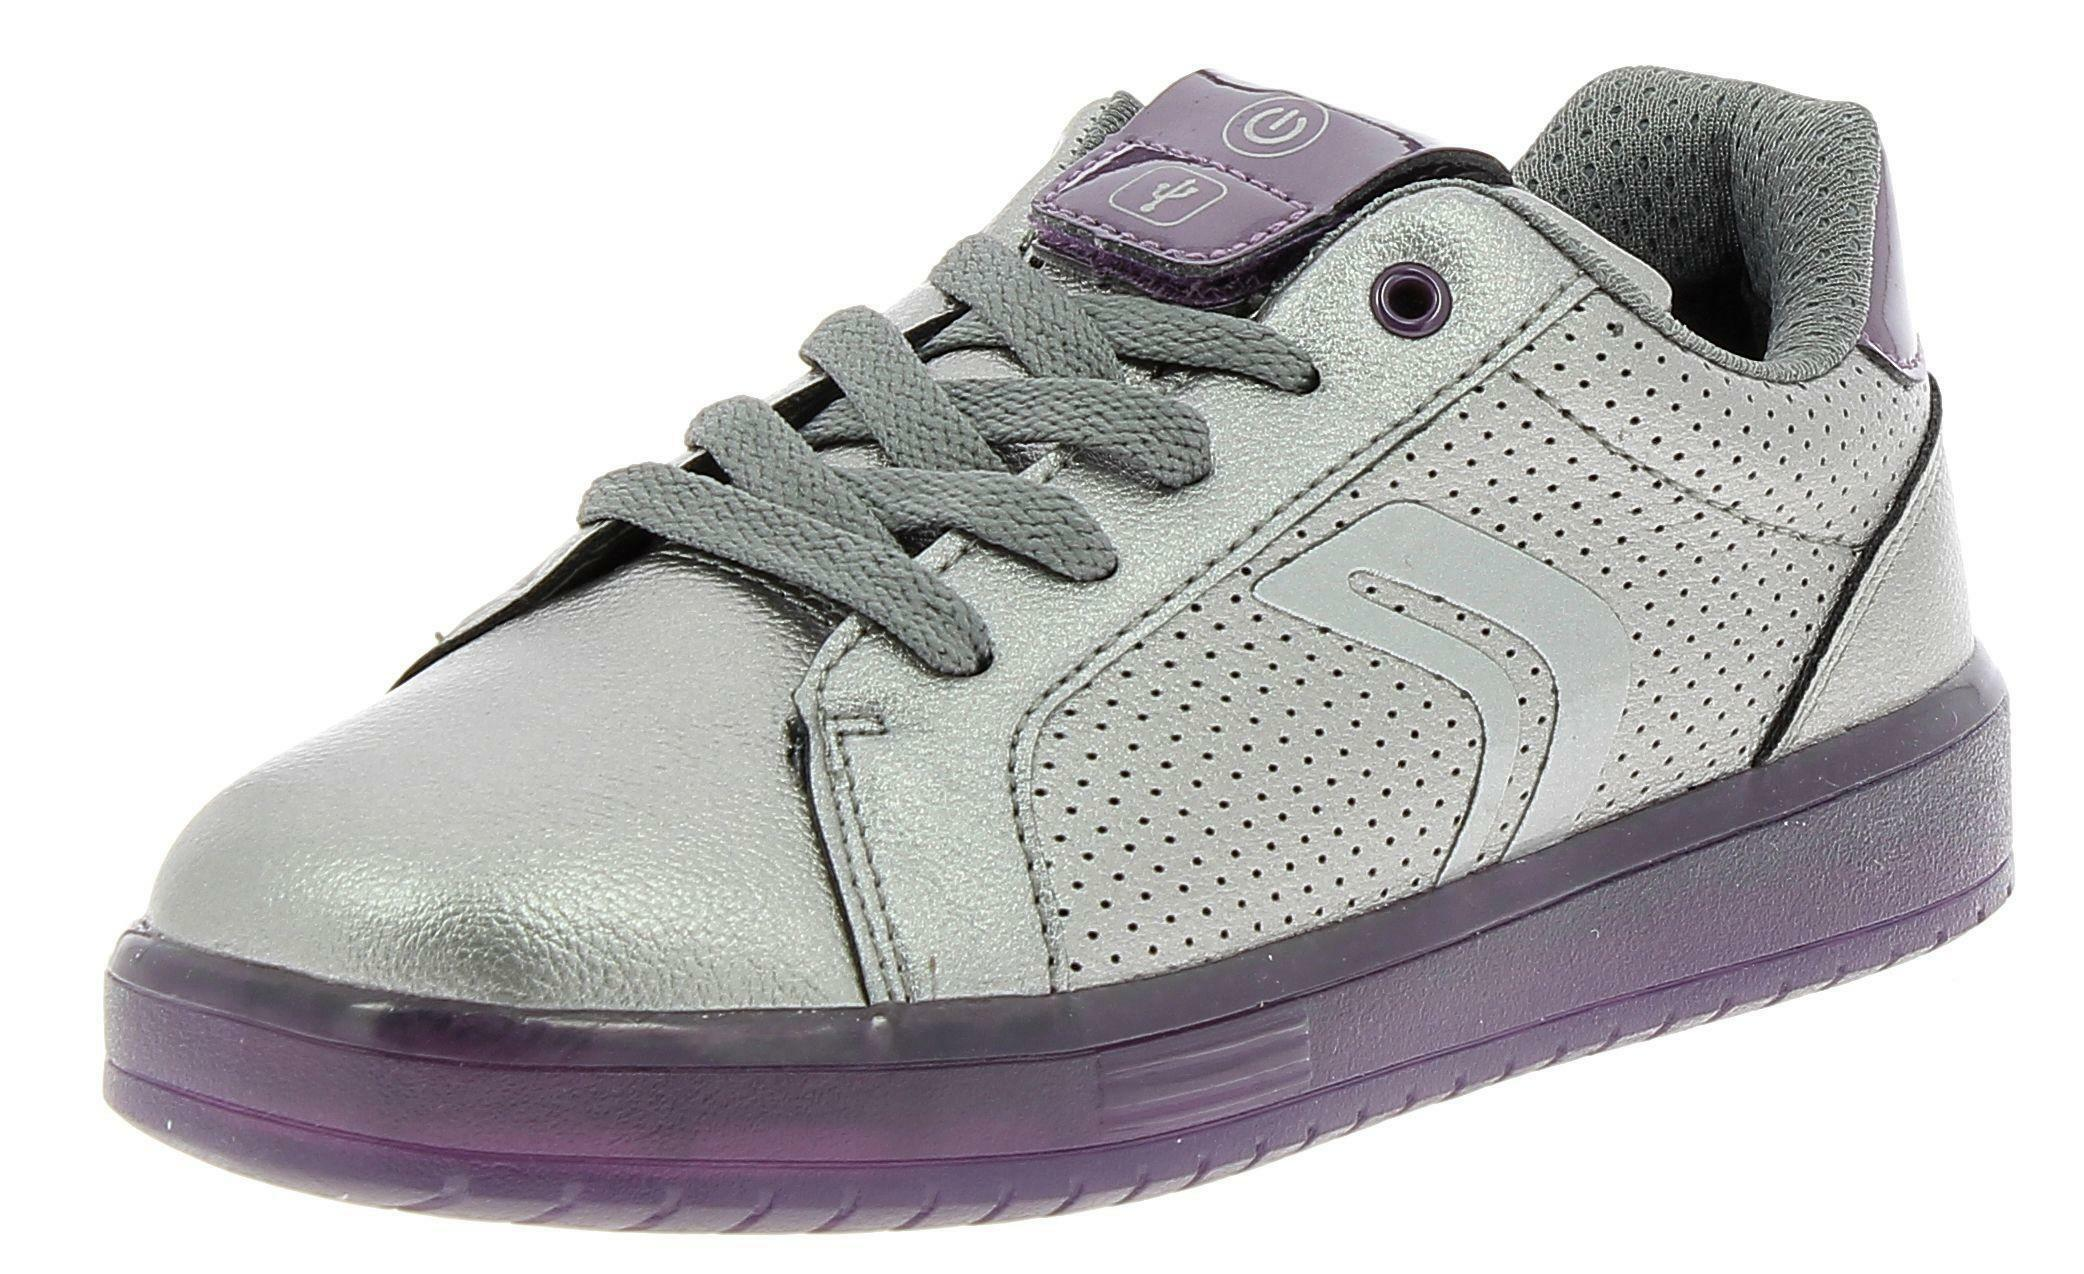 geox geox j kommodor g scarpe sportive bambina grigie luci